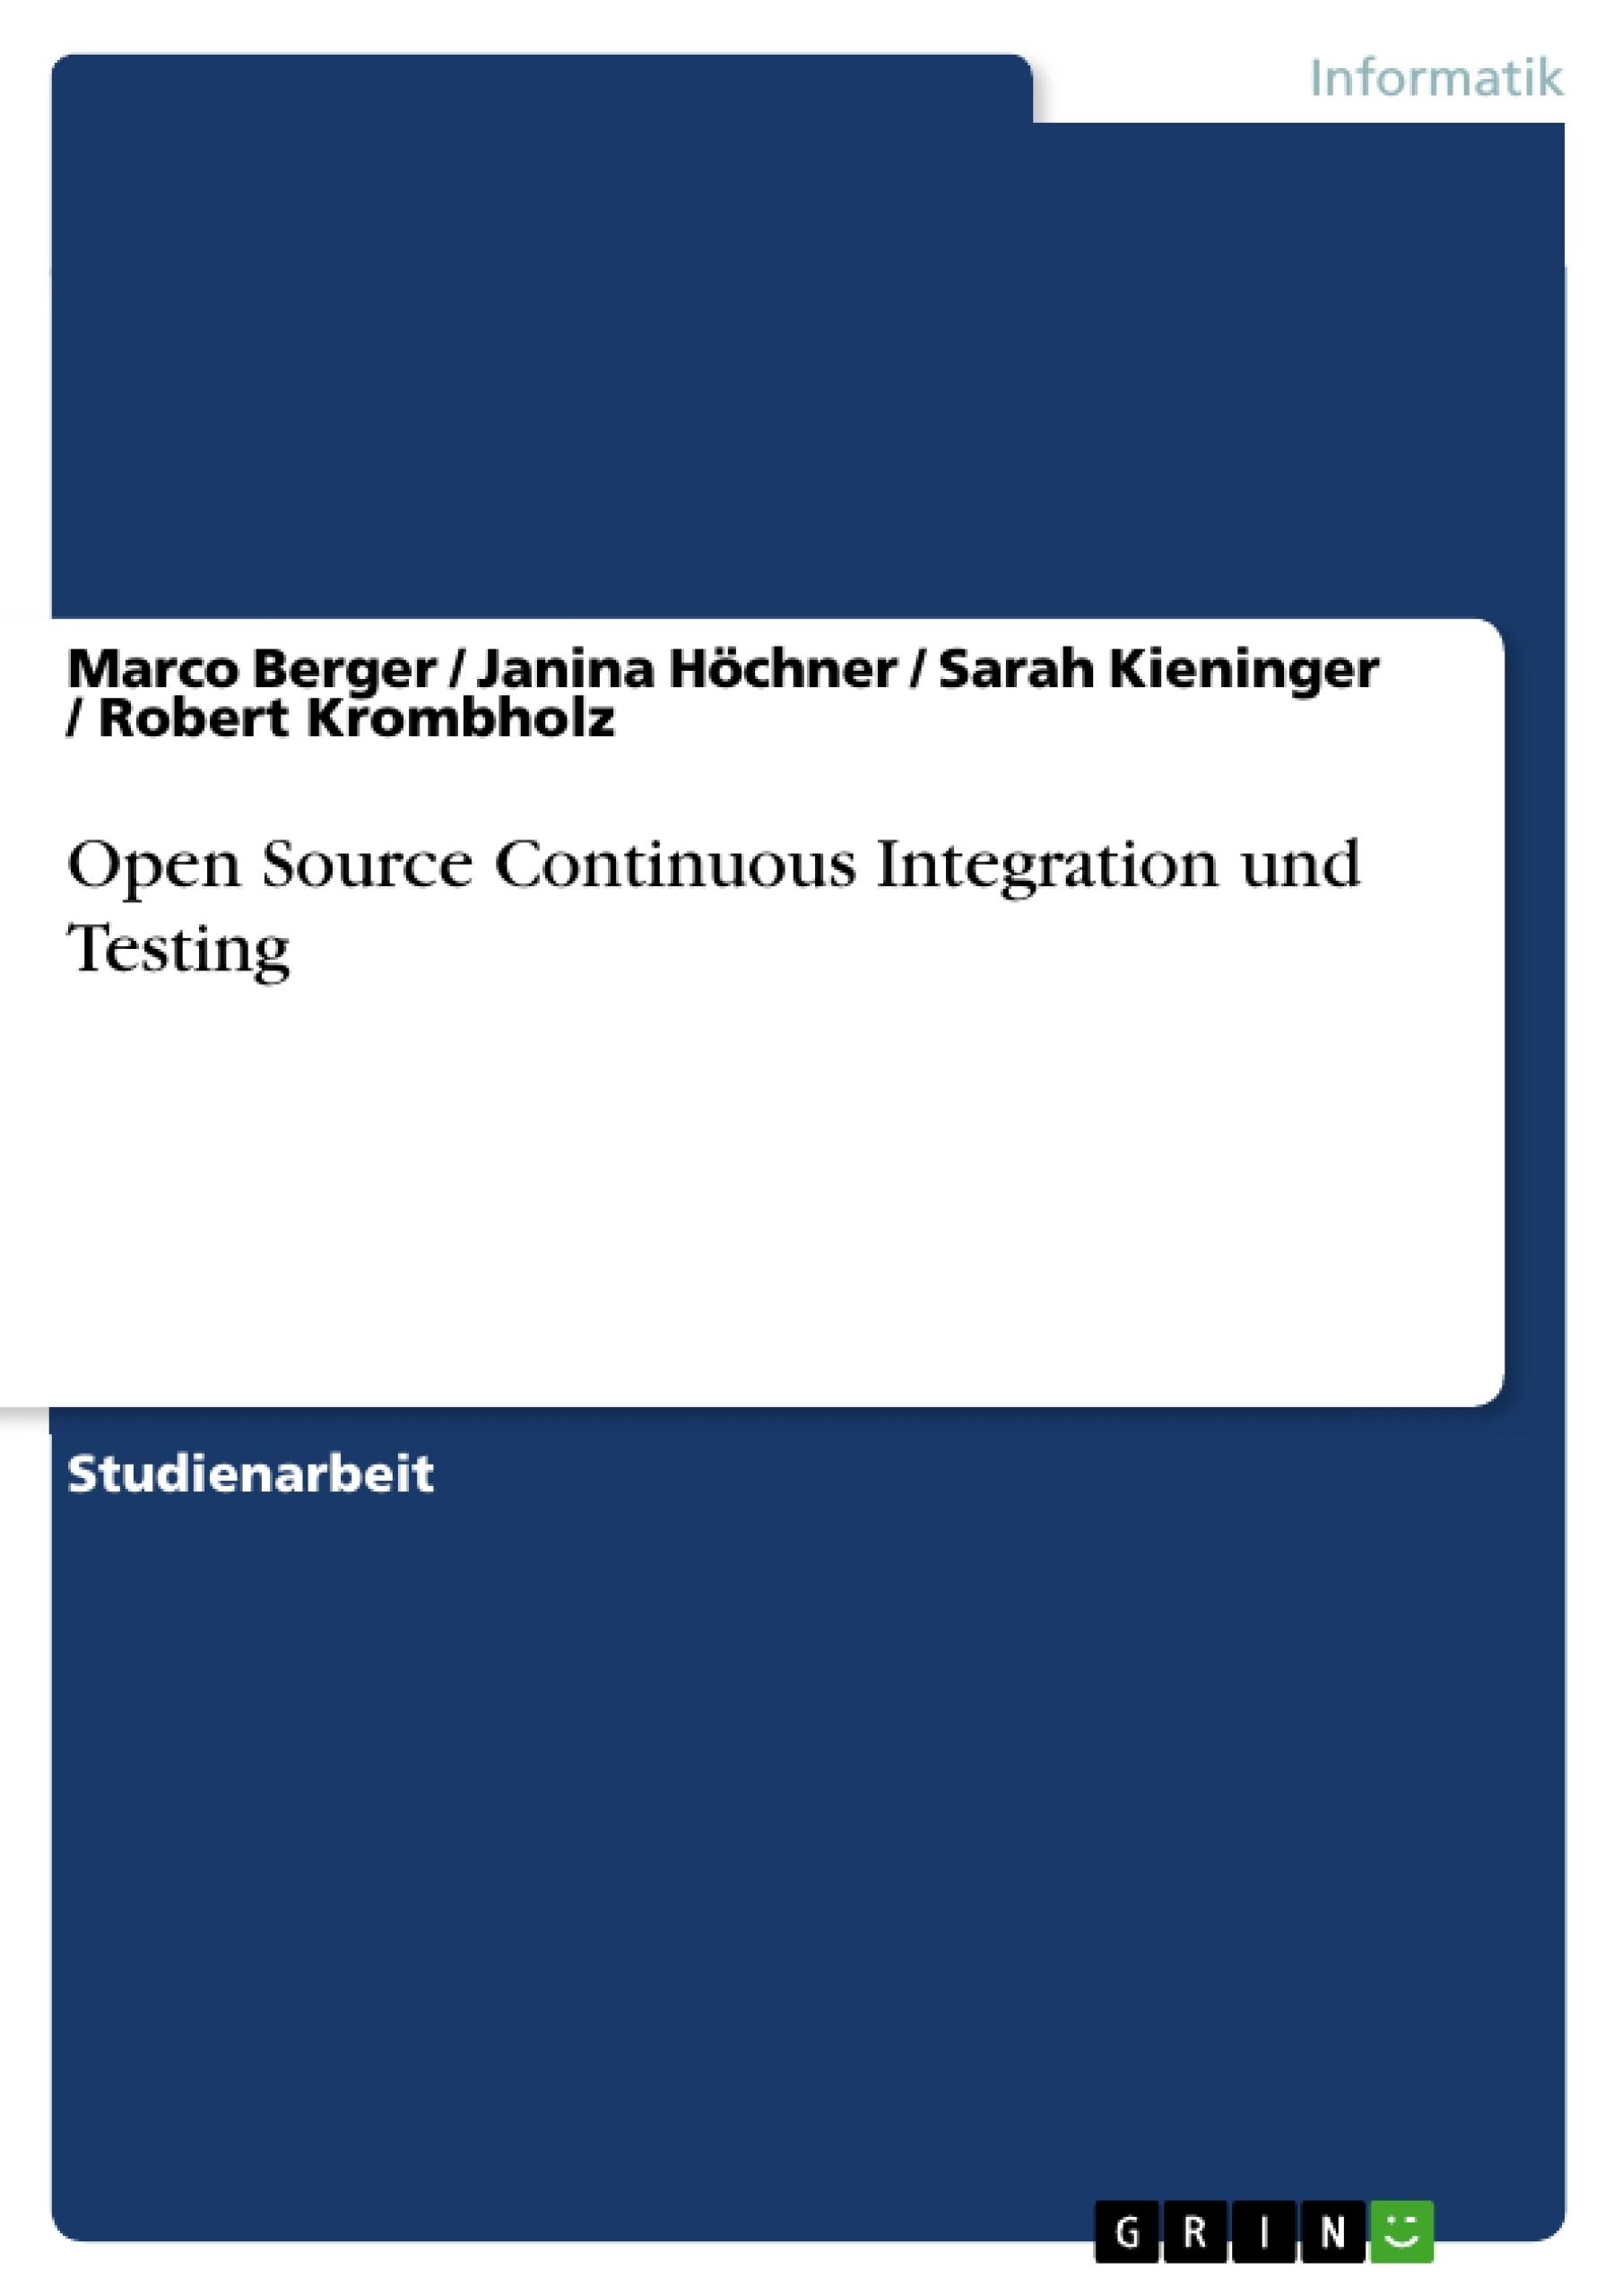 Titel: Open Source Continuous Integration und Testing